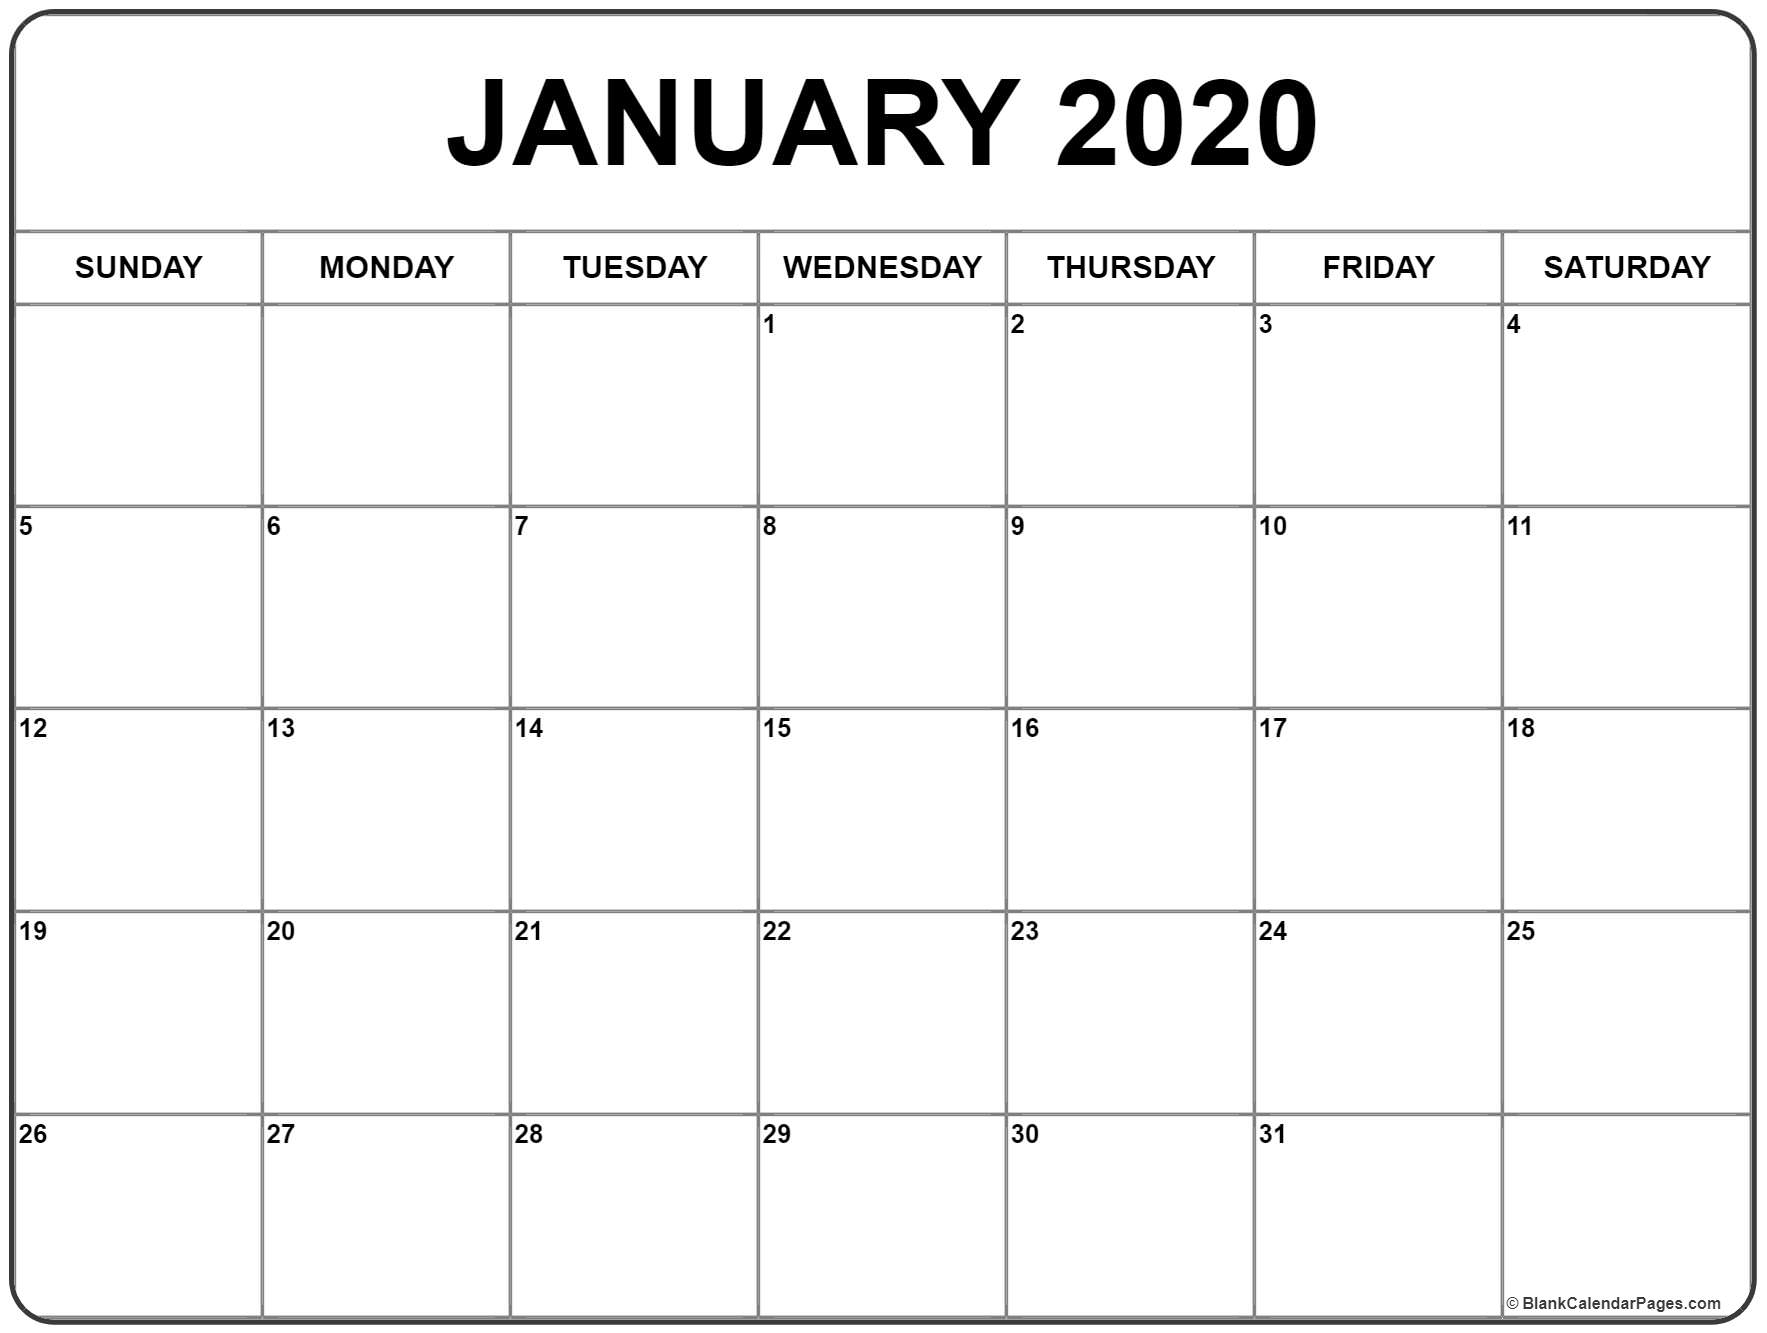 Blank January 2020 Calendar Printable - Togo.wpart.co